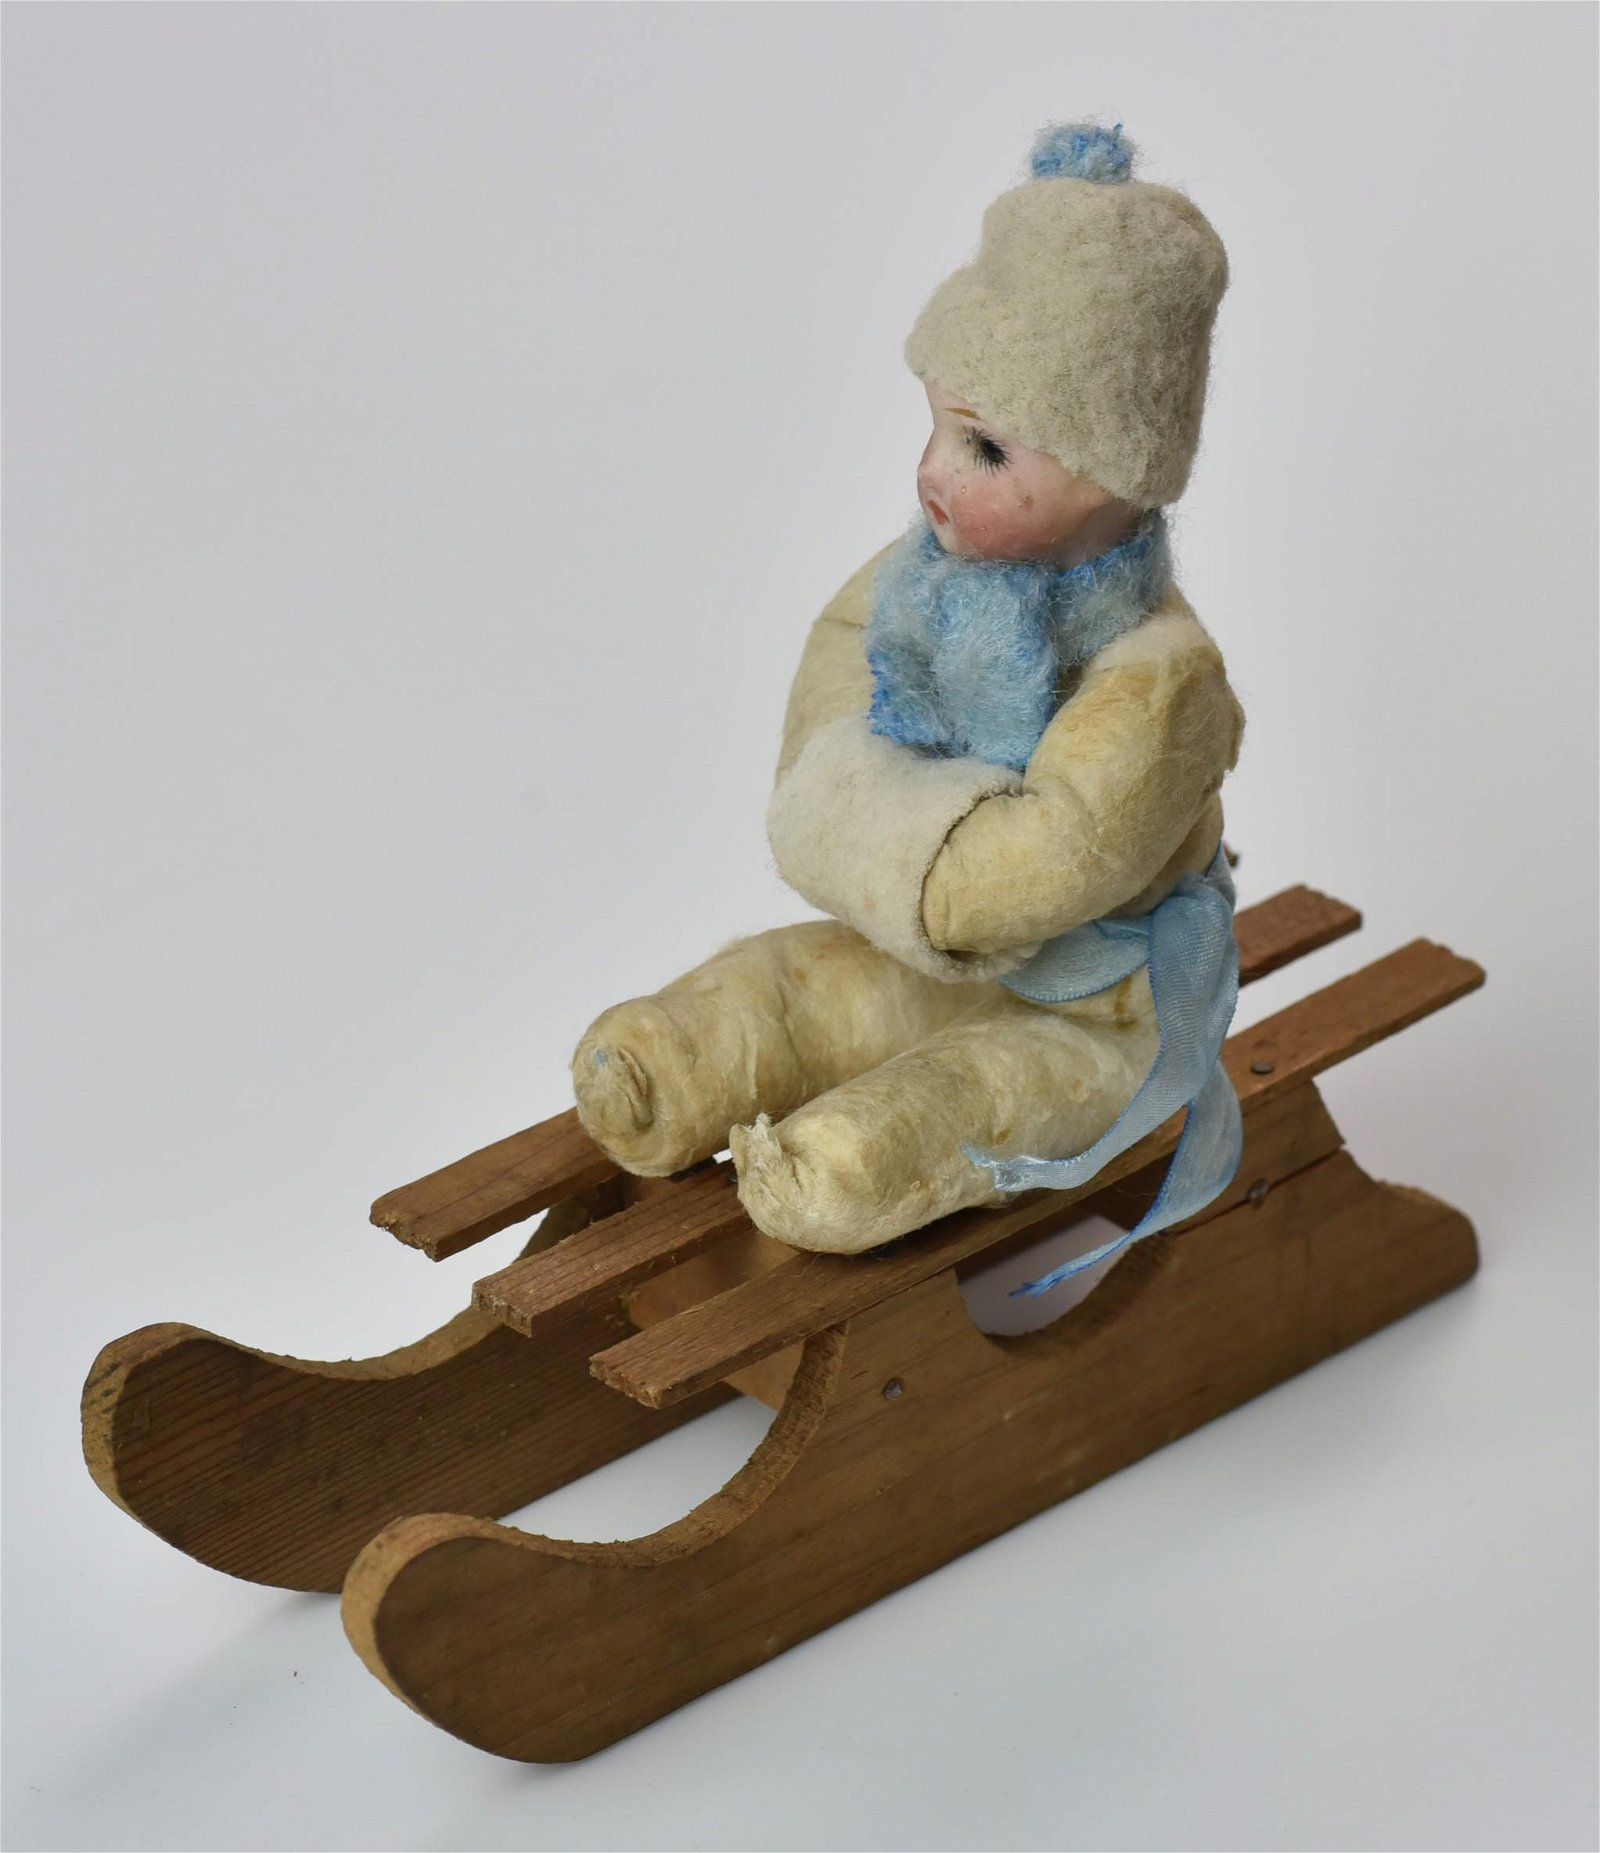 Heubach Child on Wood Sled